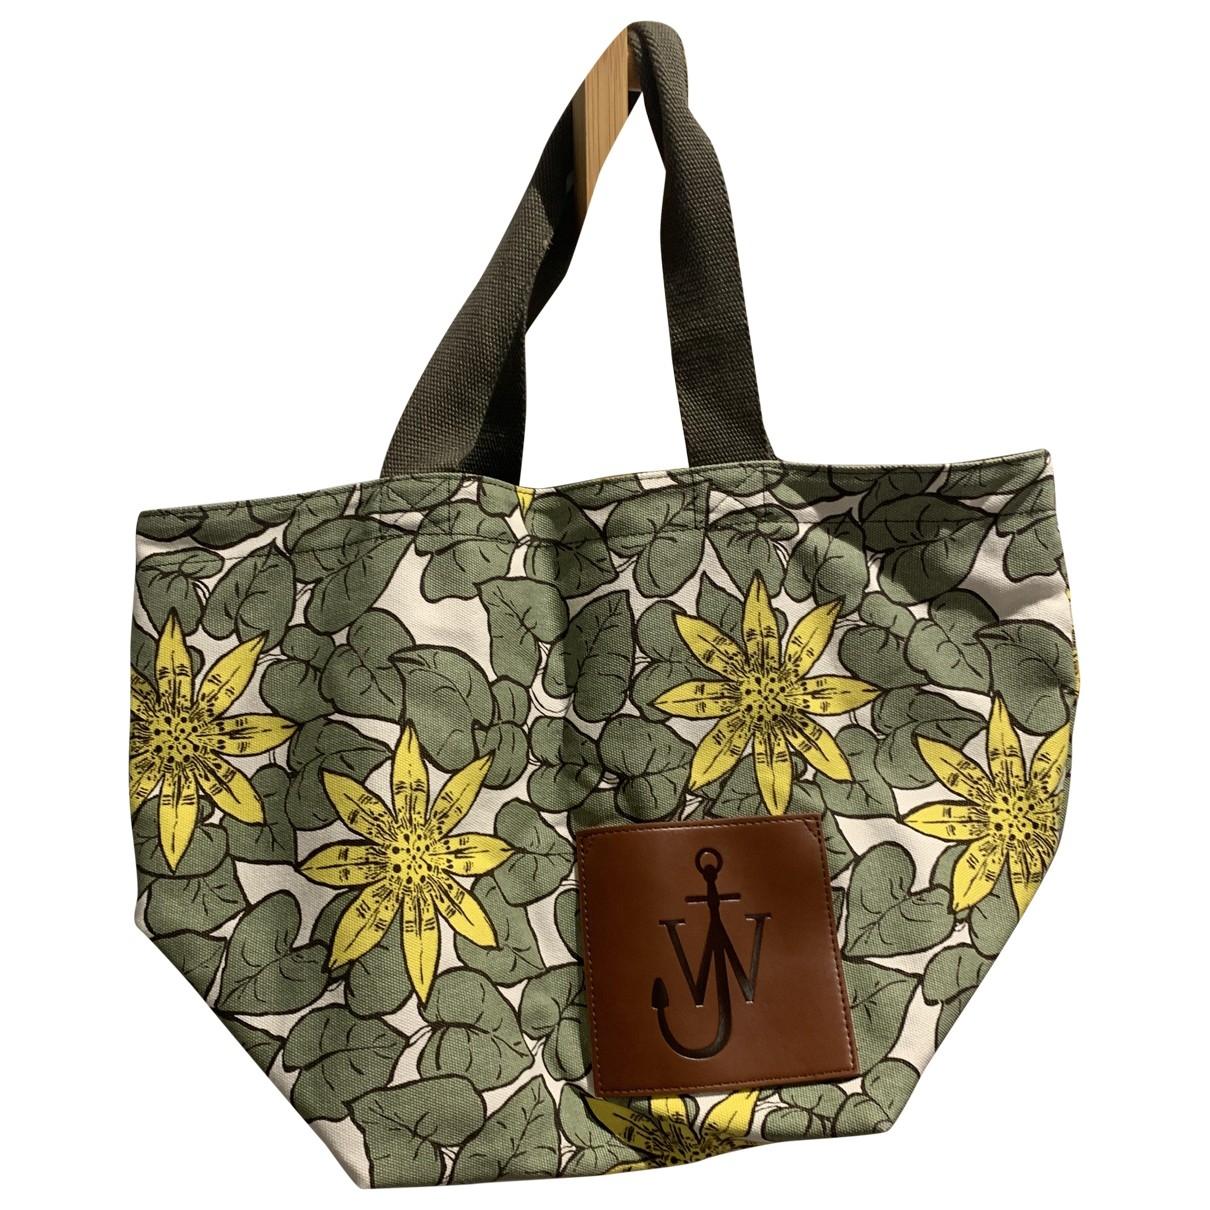 J.w. Anderson \N Green Cotton handbag for Women \N